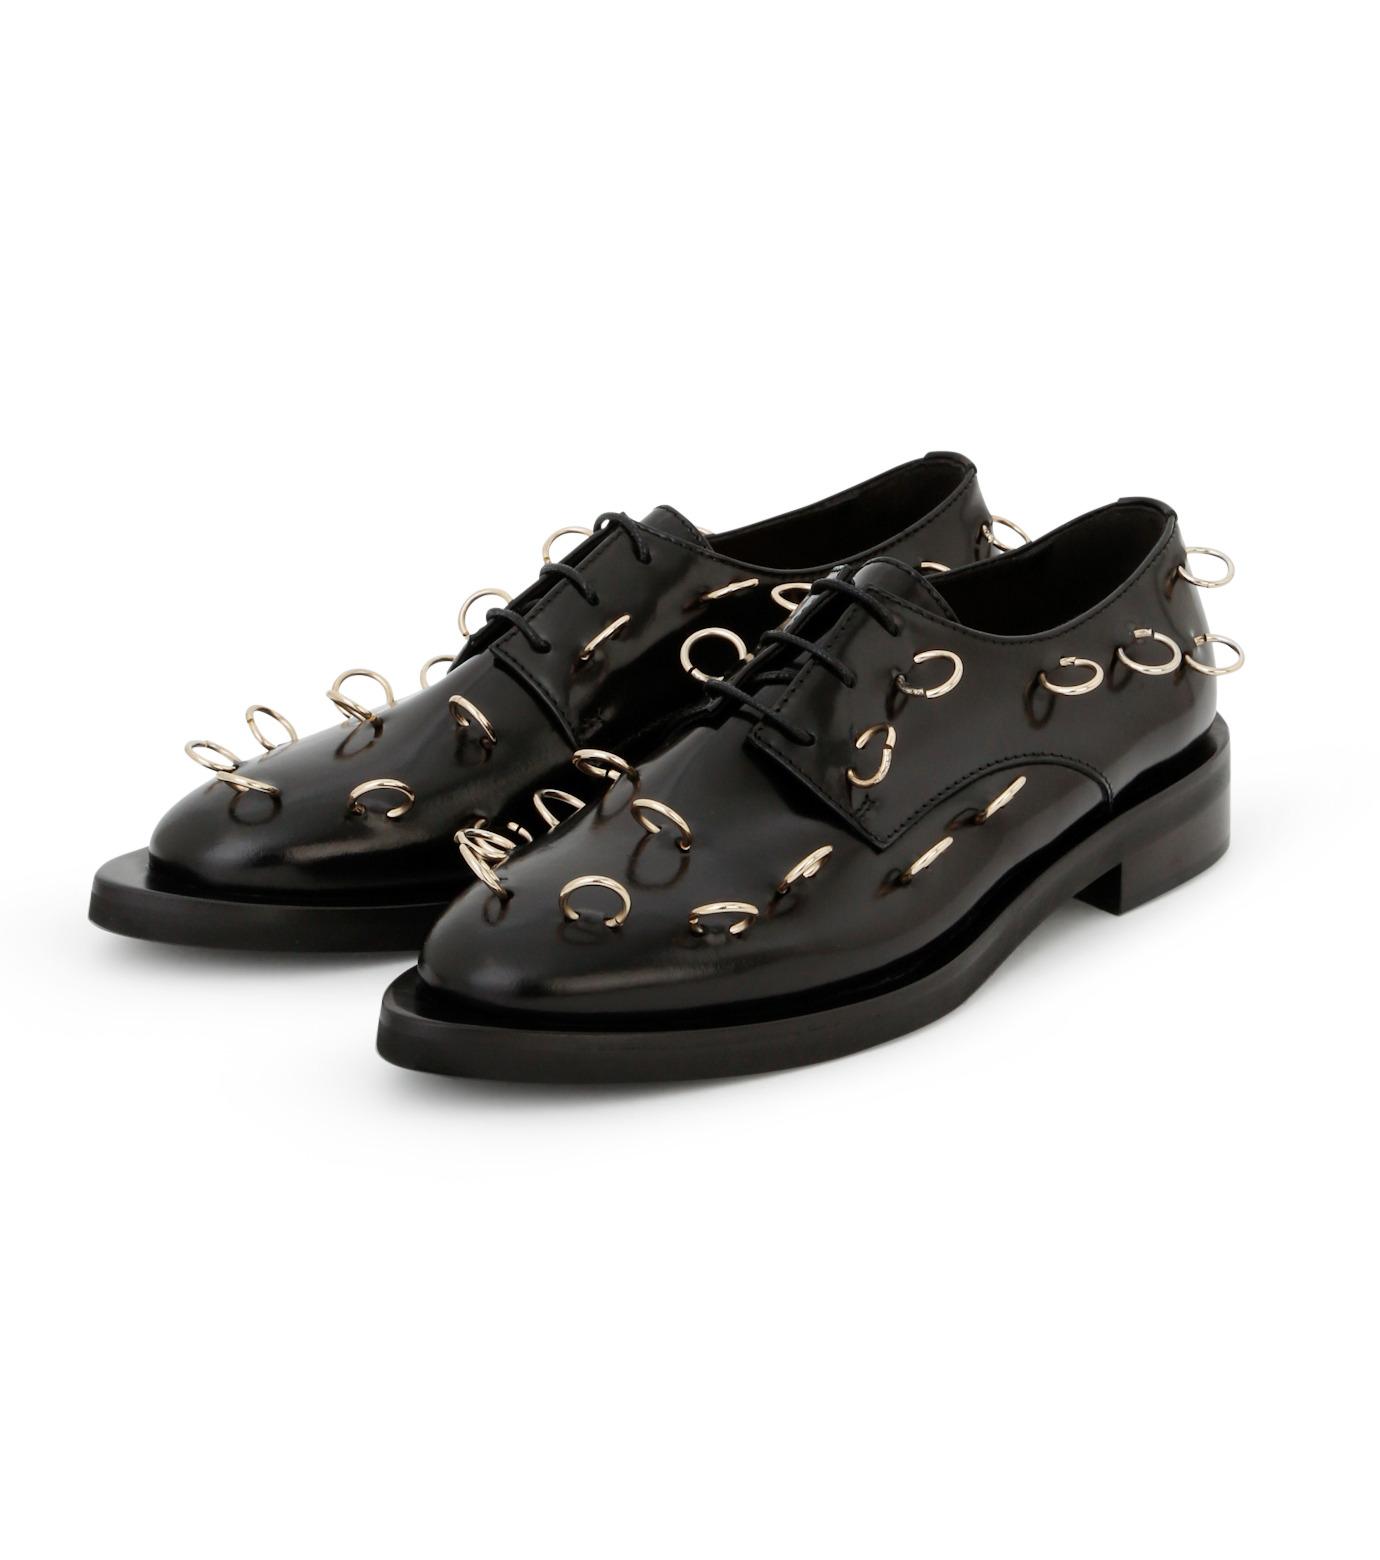 Coliac(コリアック)のRei Rings-BLACK(フラットシューズ/Flat shoes)-64CC023-13 拡大詳細画像2